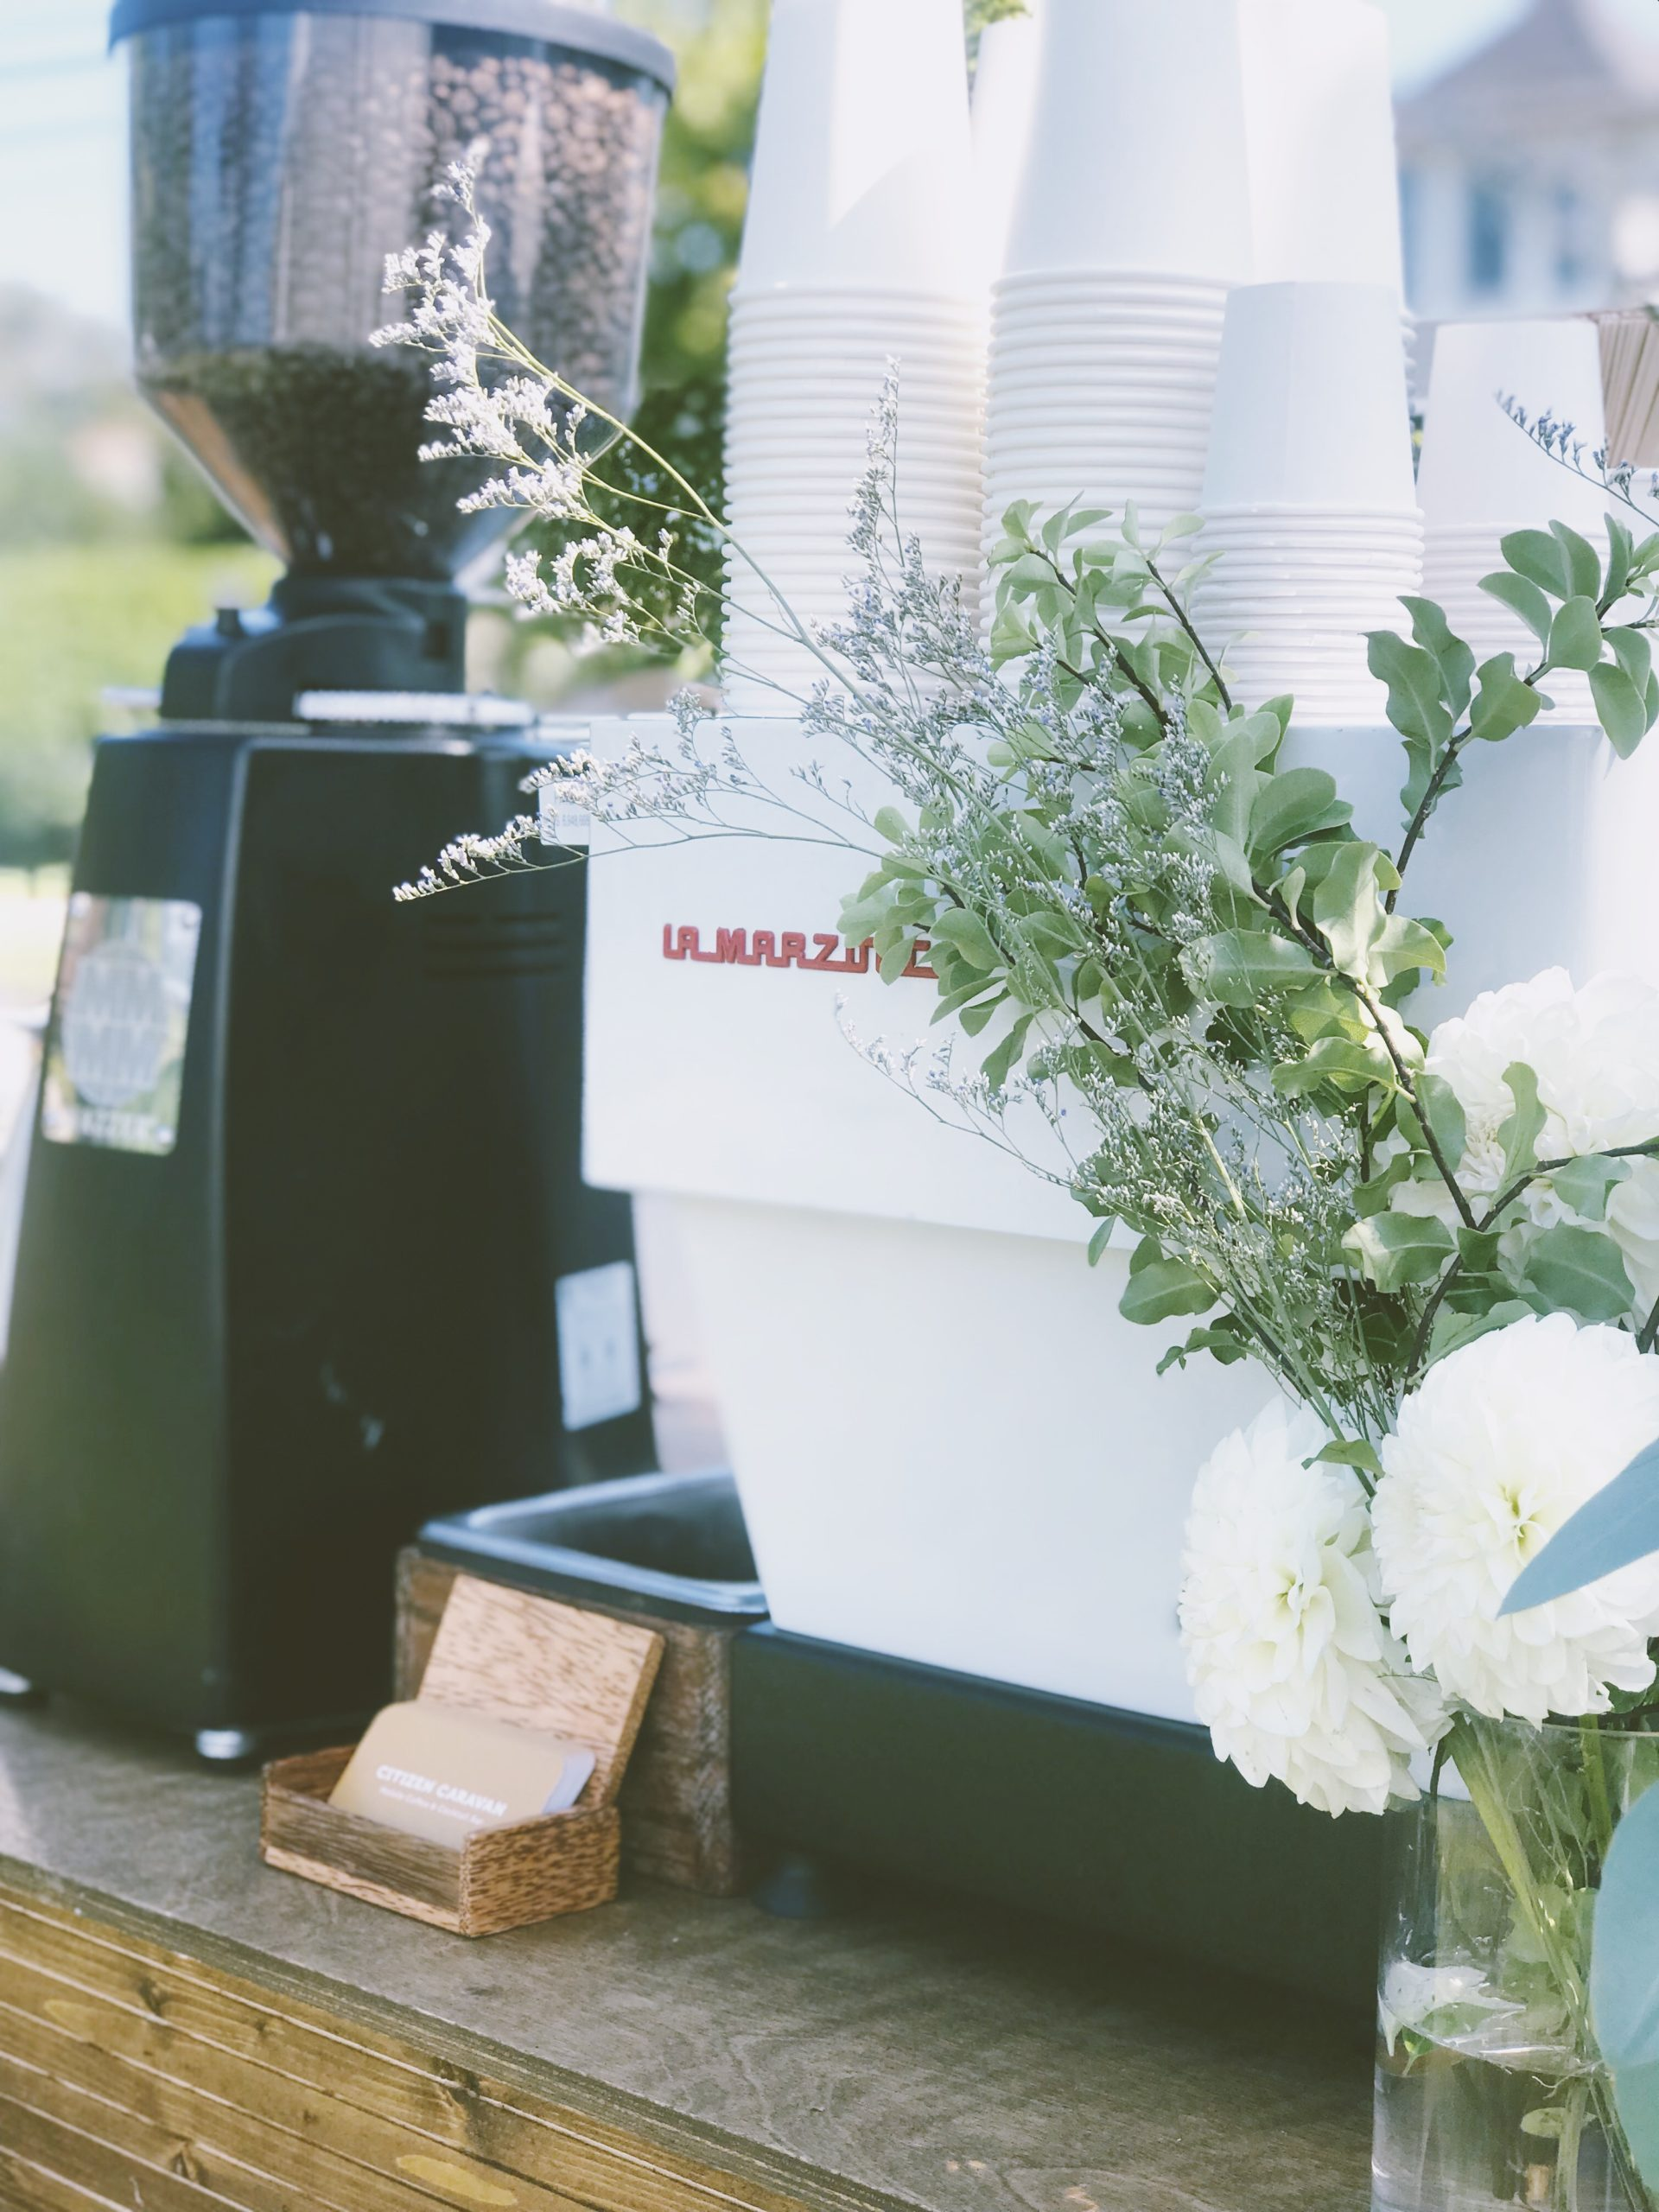 Espresso cart service New York